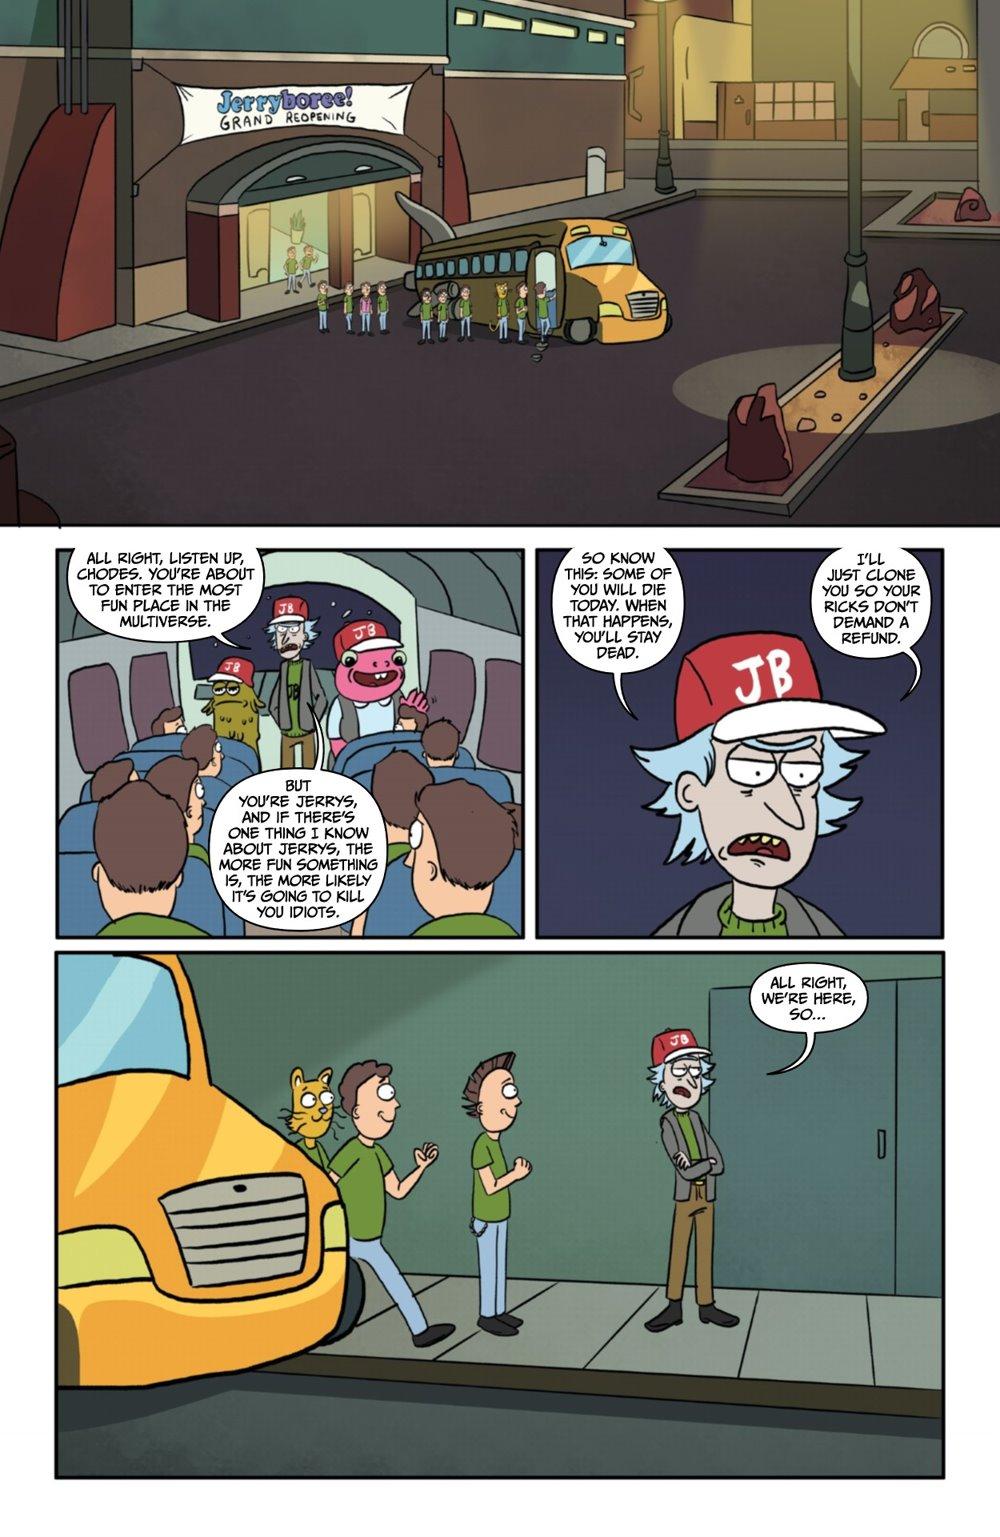 RM-PRES-JERRYBOREE-1-MARKETING-05 ComicList Previews: RICK AND MORTY PRESENTS JERRYBOREE #1